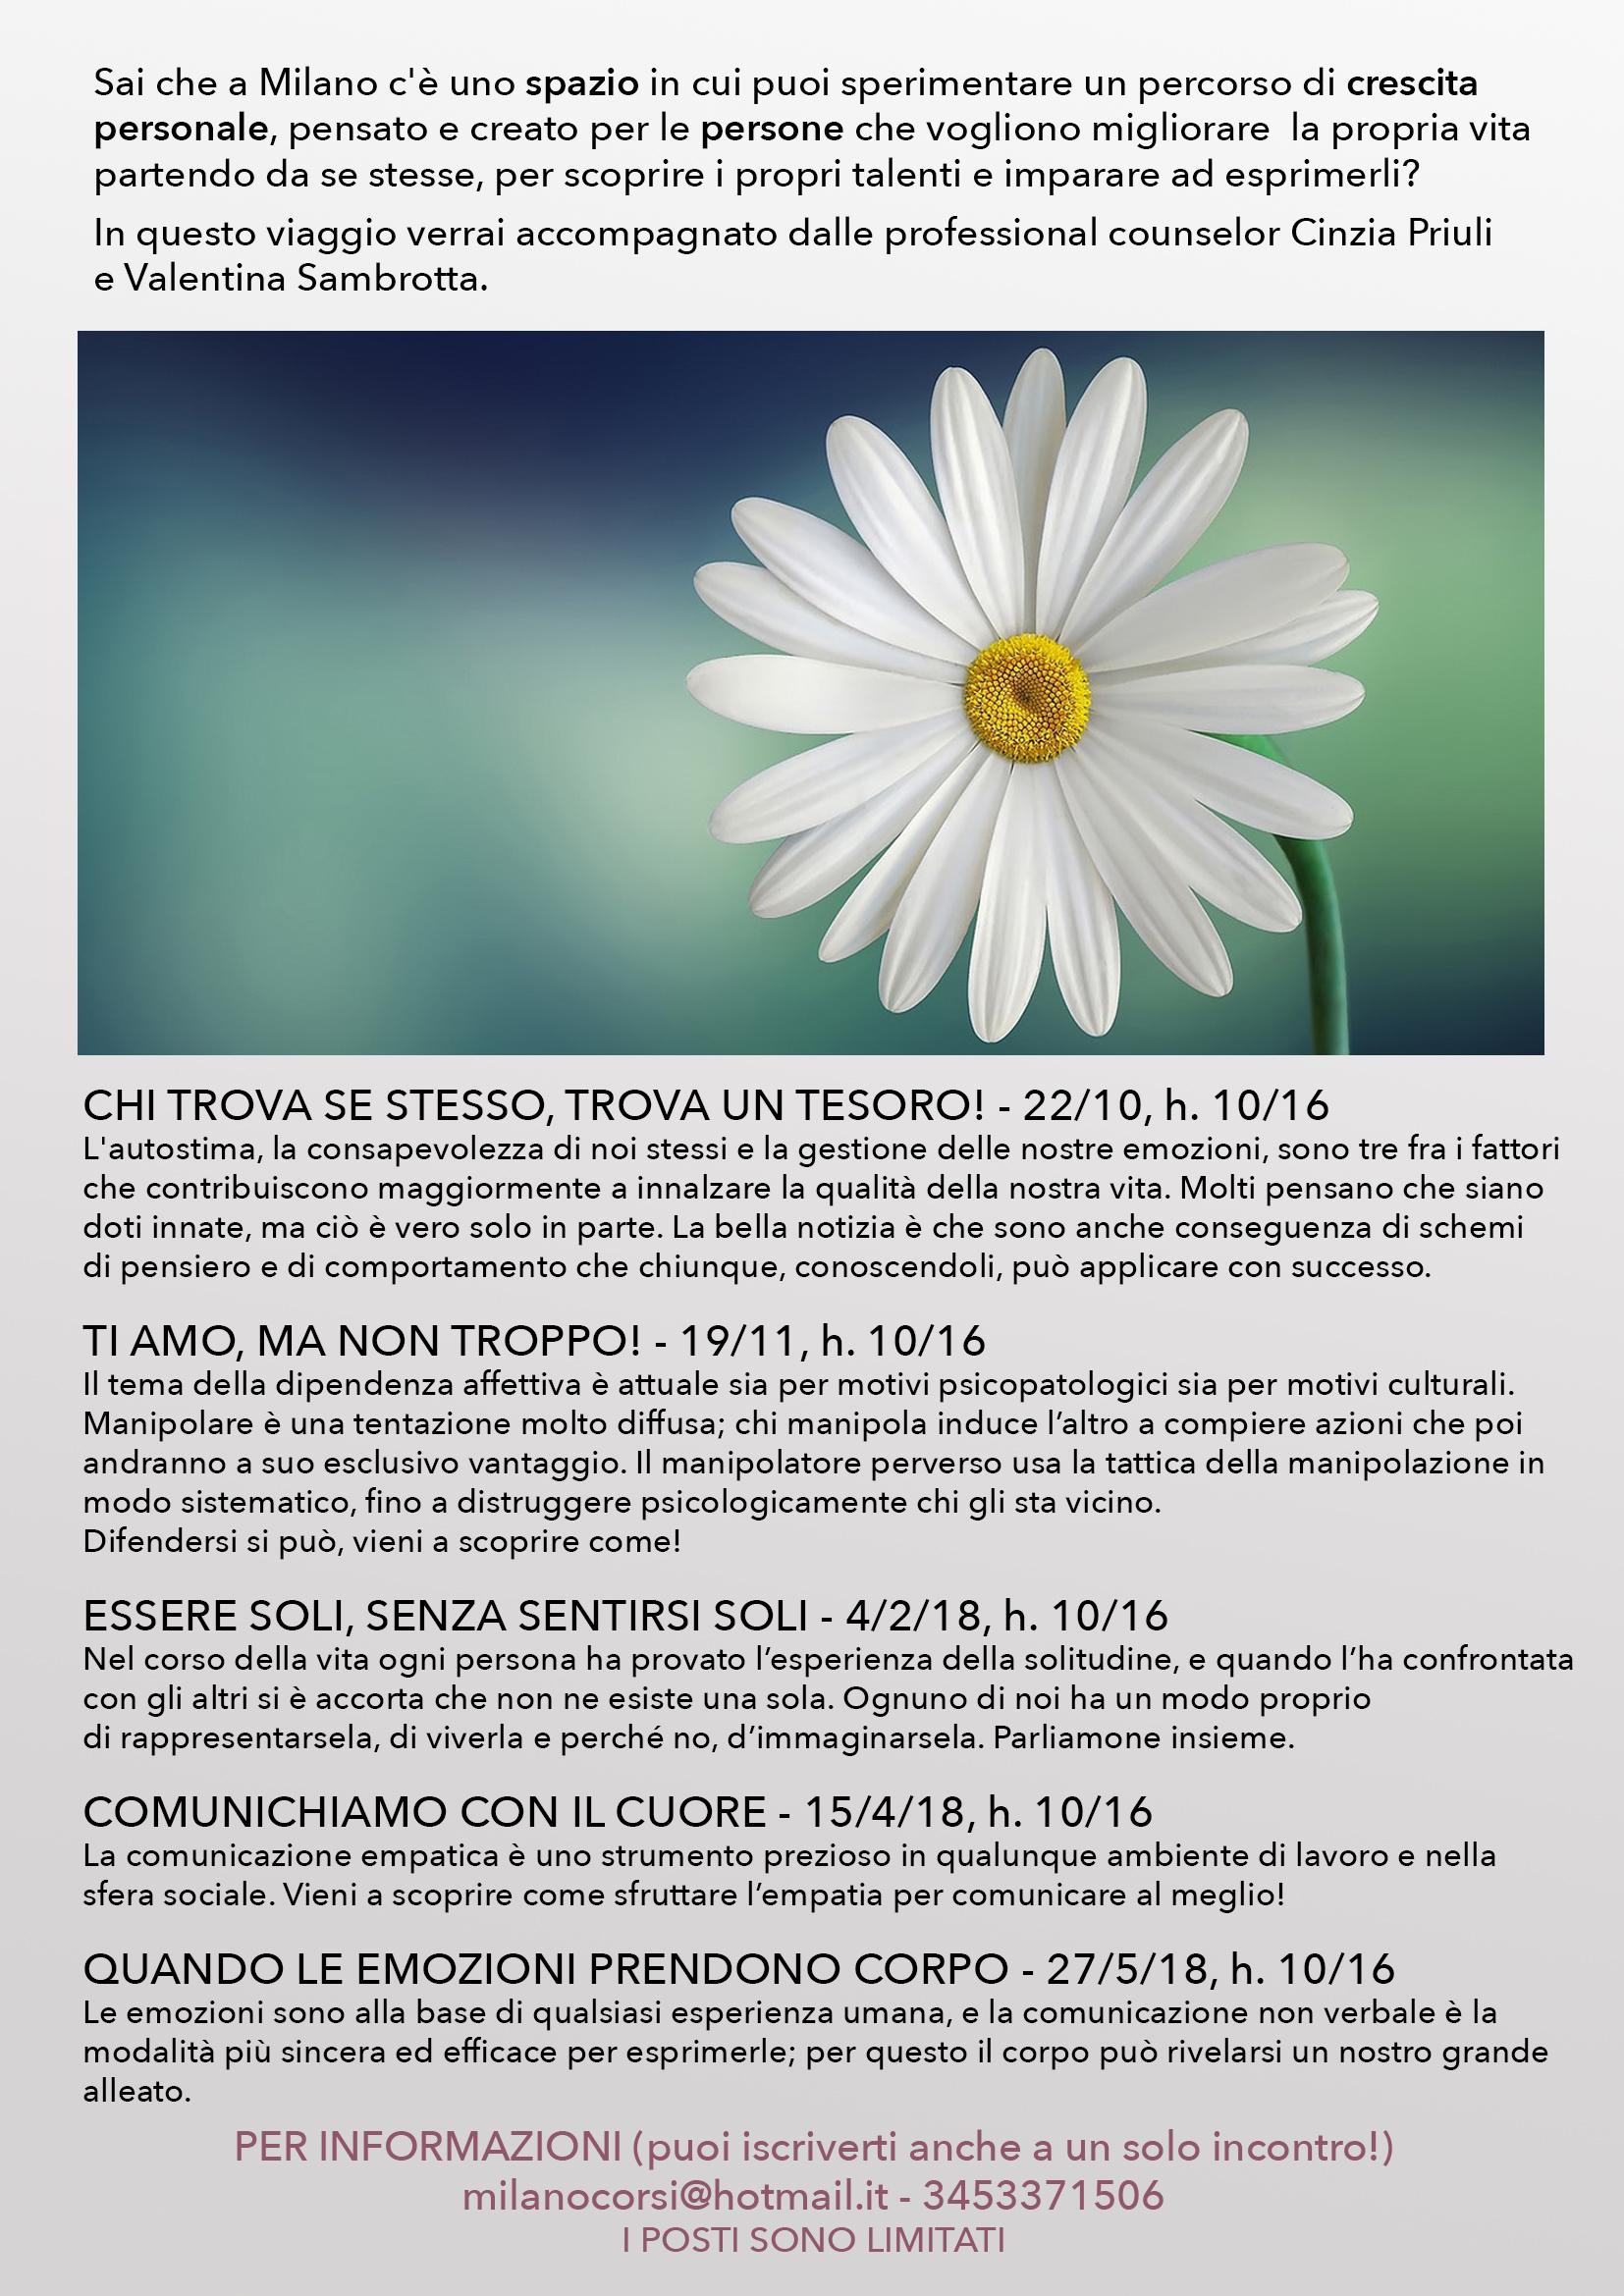 LOCANDINA UNICA Counseling Milano